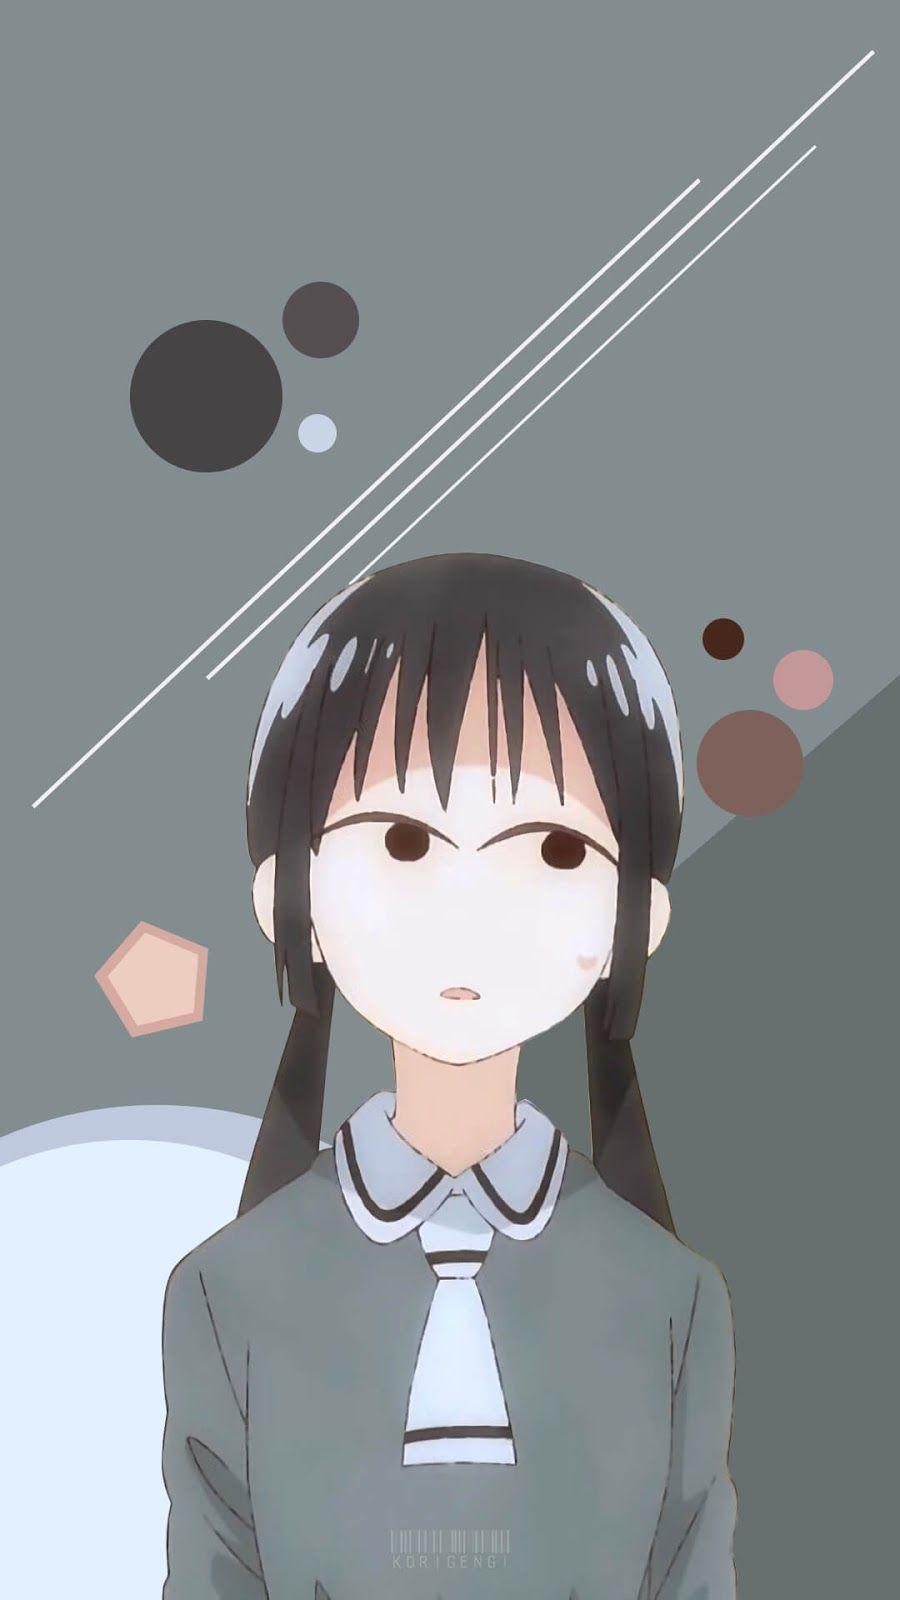 Download Asobi Asobase : download, asobi, asobase, Honoka, Honda, Asobi, Asobase, Wallpaper, Korigengi, Anime, Source, Wallpaper,, Funny,, Kawaii